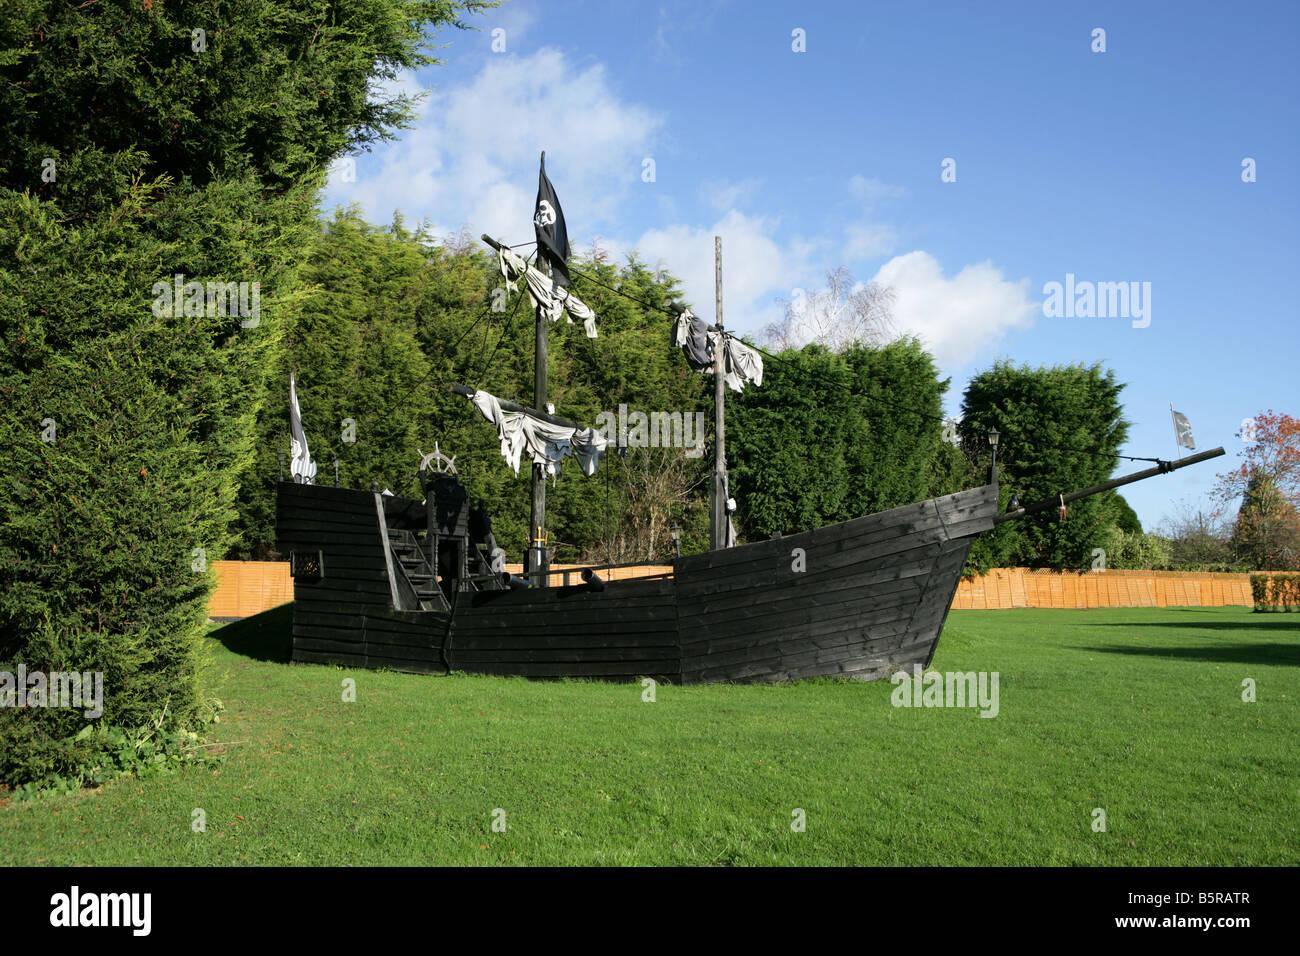 Ordinaire Model Pirate Ship In Garden   Stock Image